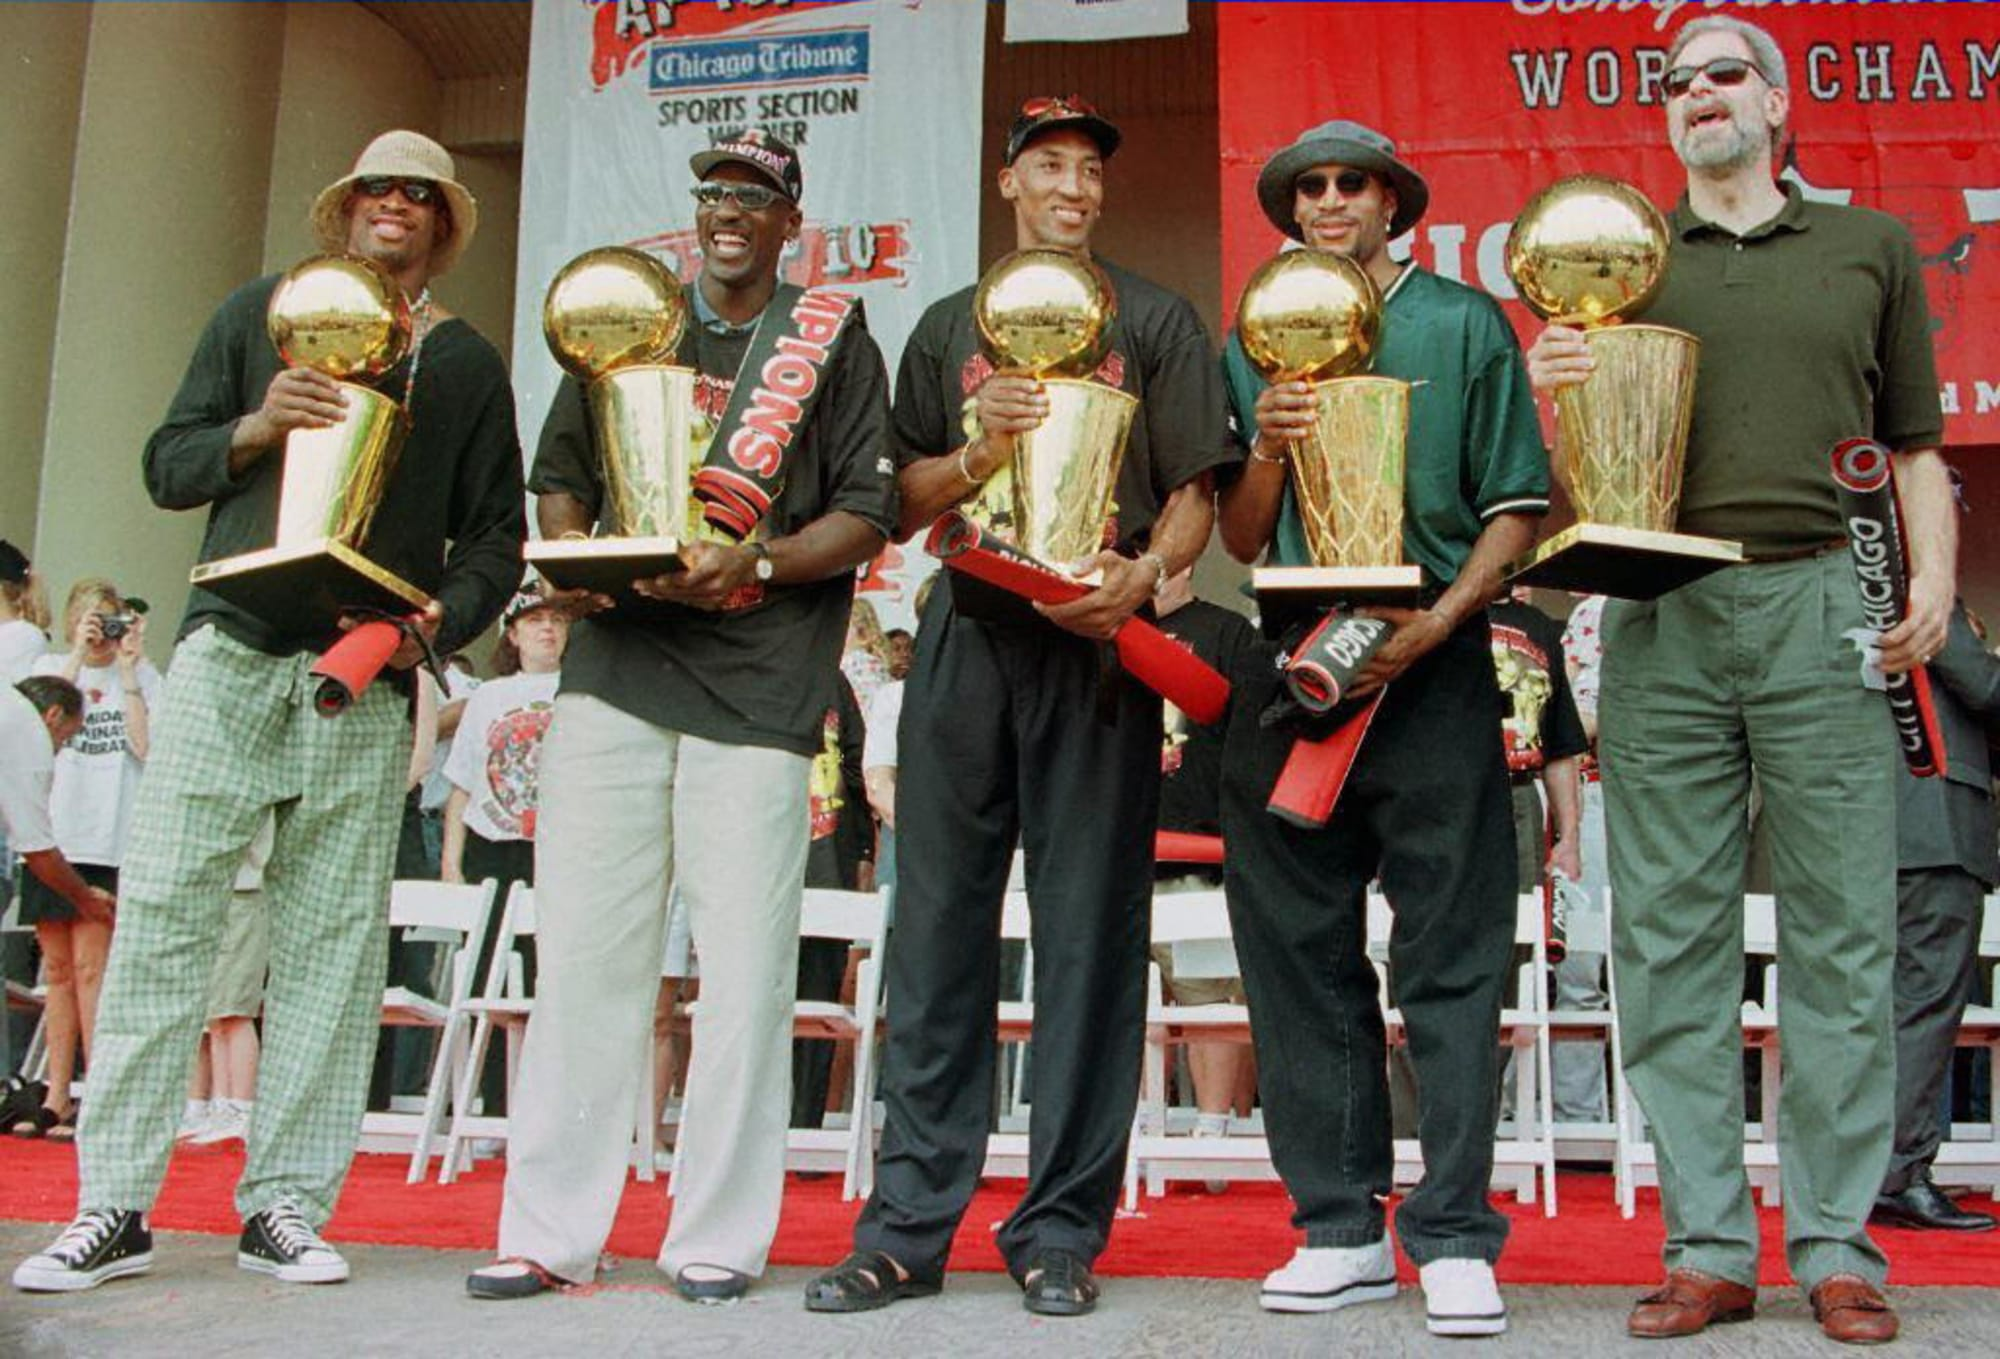 Chicago Bulls: Unsung heroes from championship era